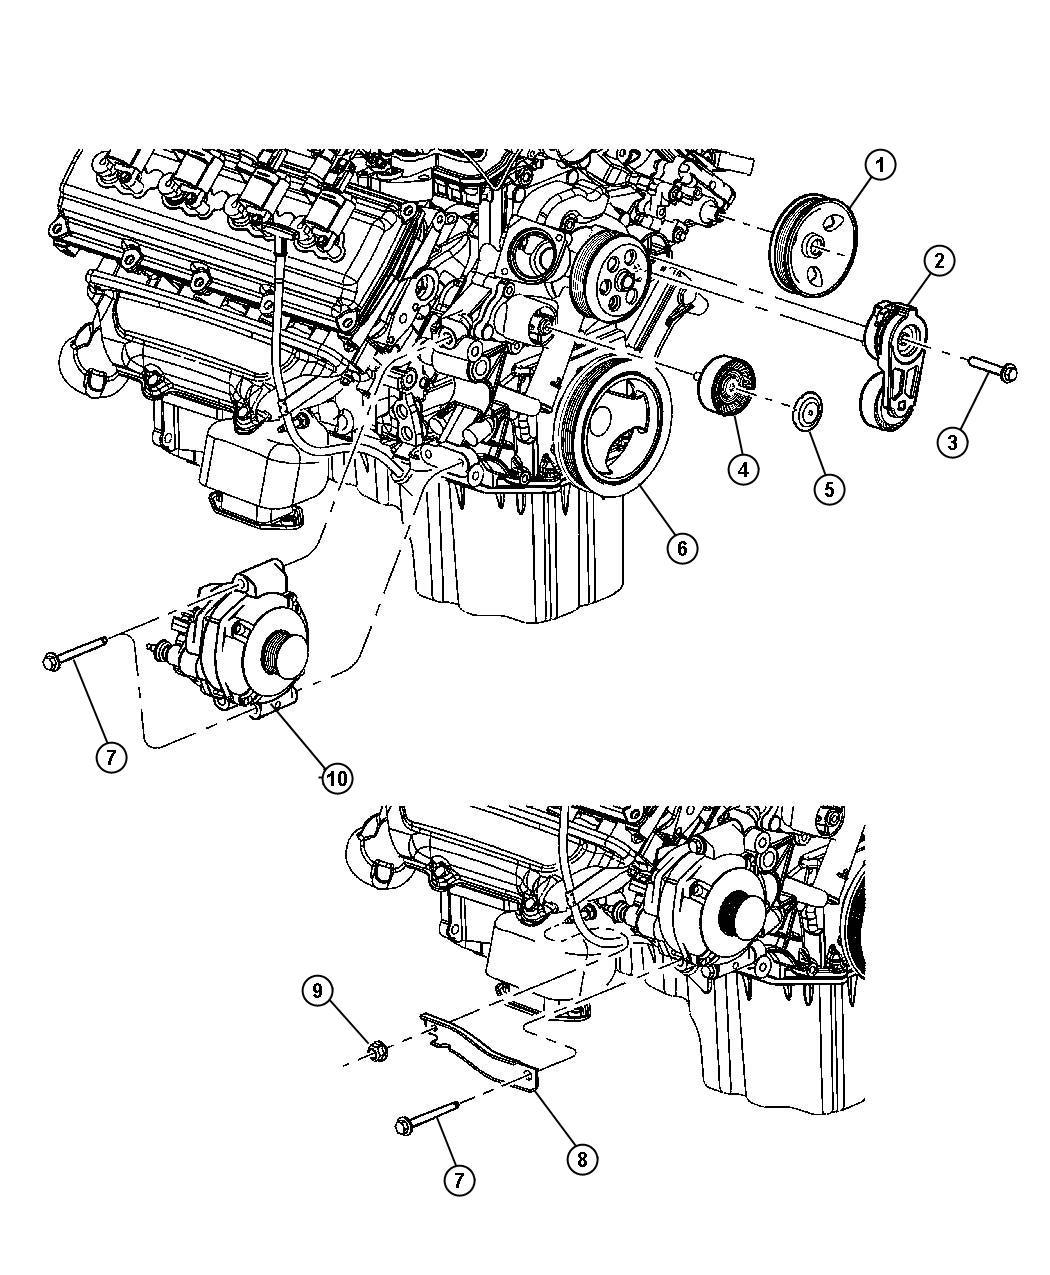 2013 chrysler 200 alternator  engine   bab   amp